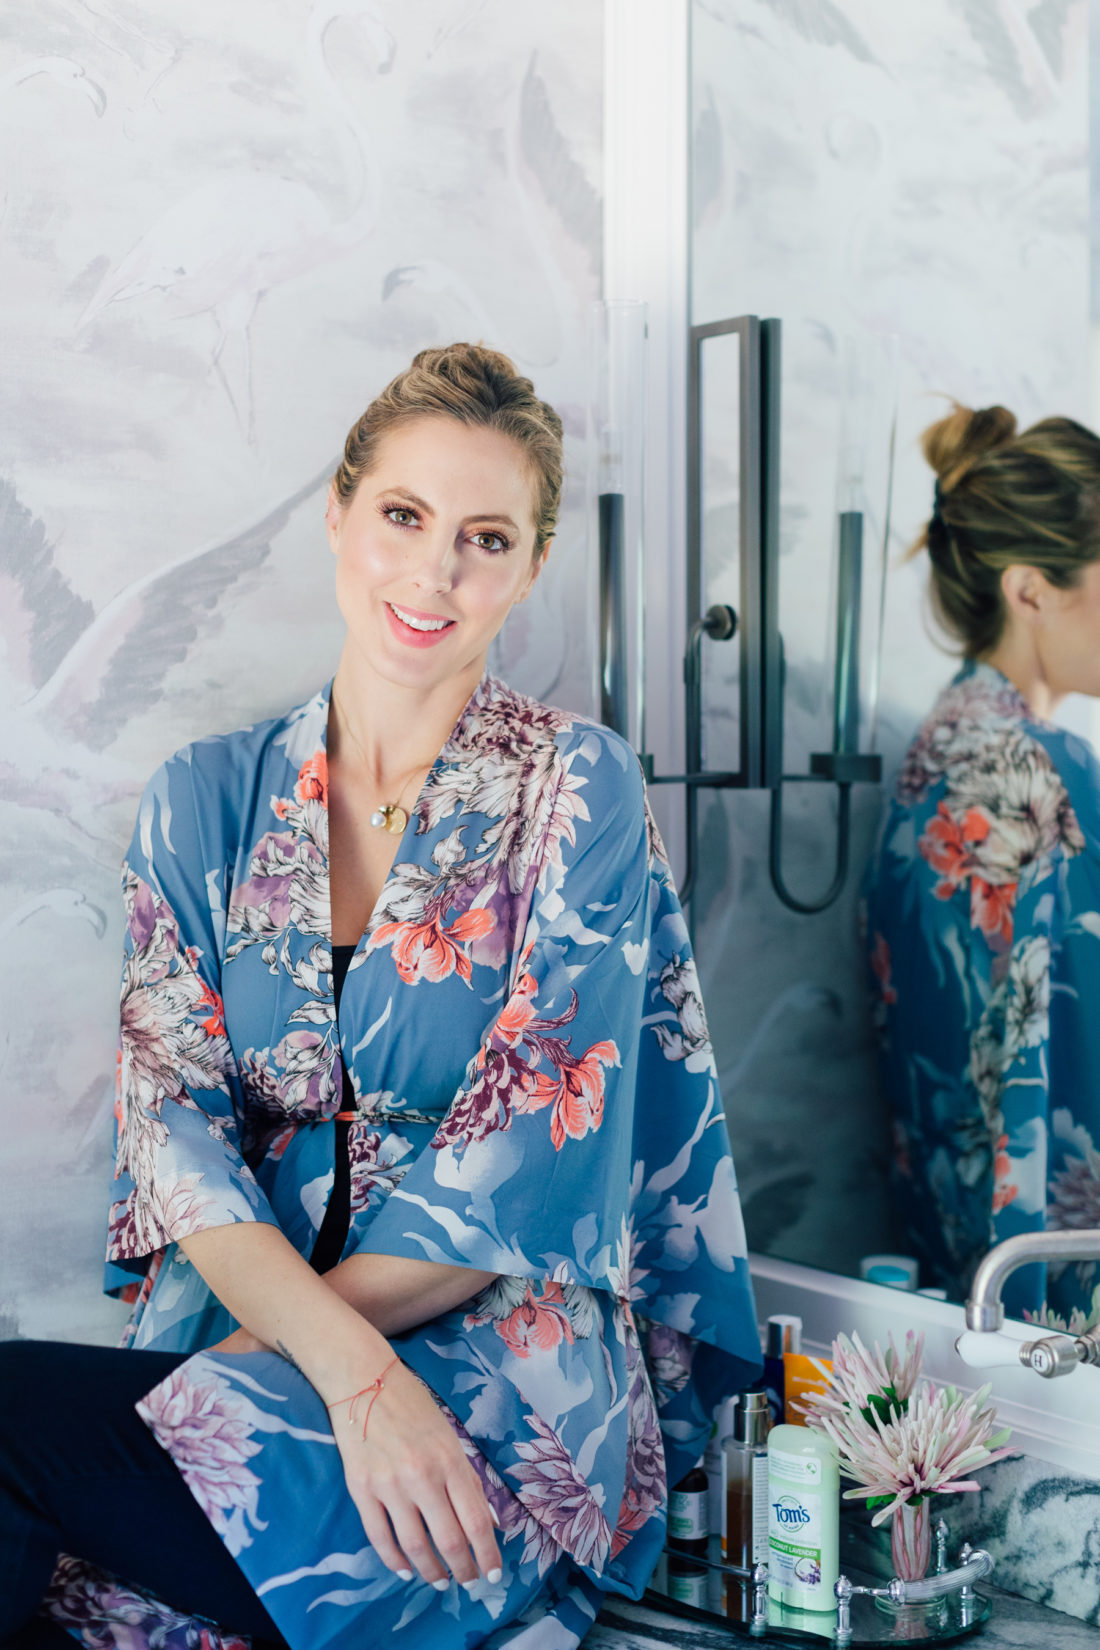 Eva Amurri Martino shares her updated pregnancy safe beauty routine